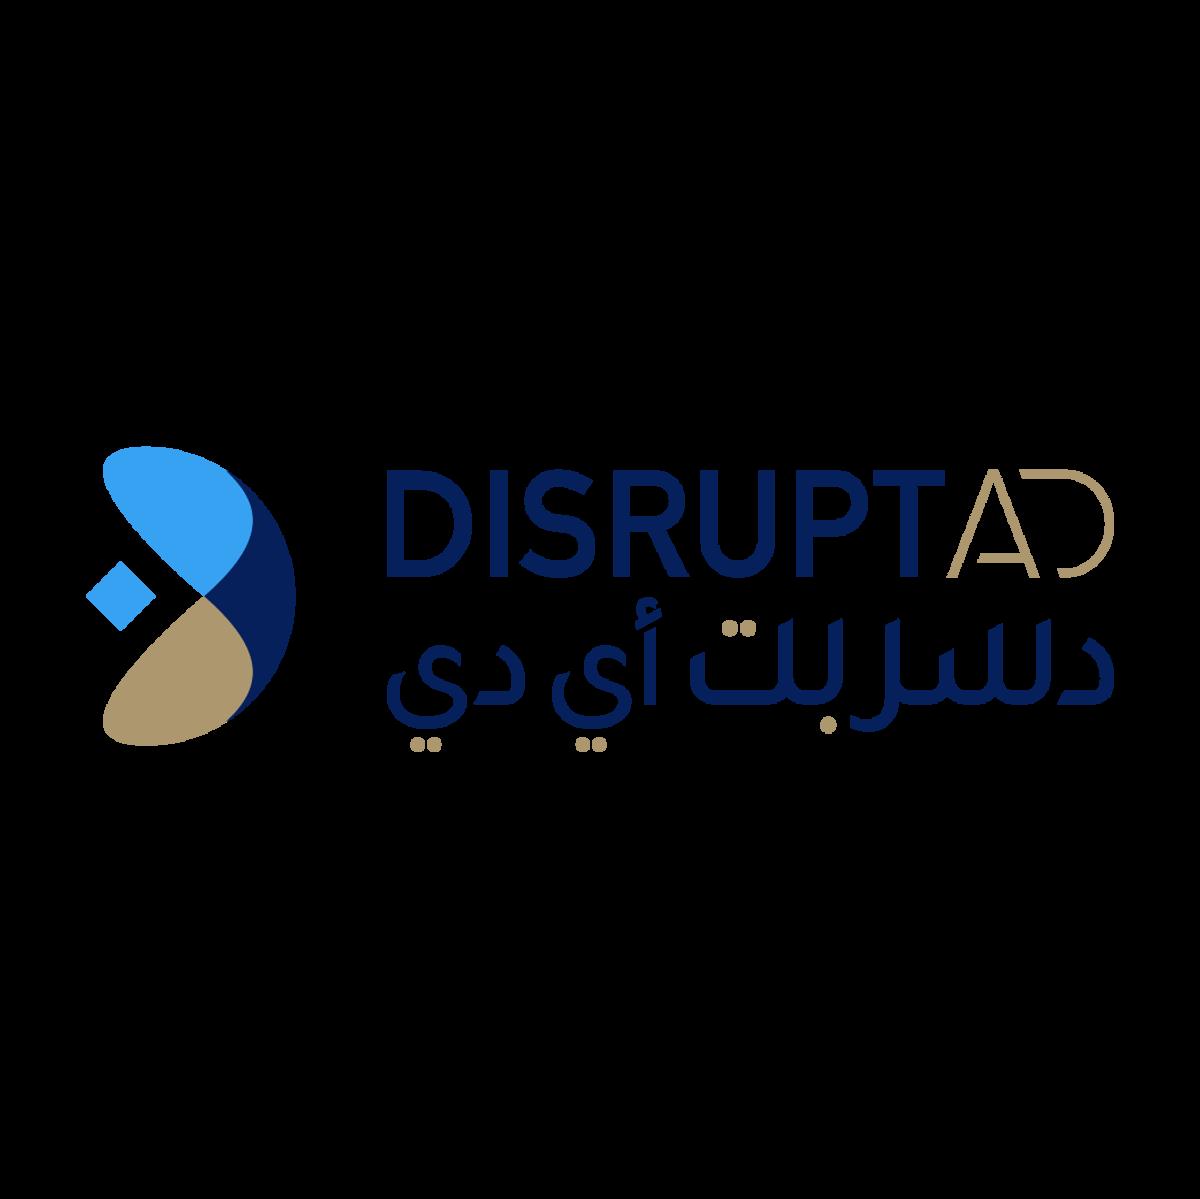 adq-consolidates-its-venture-capital-efforts-under-disruptad-platform